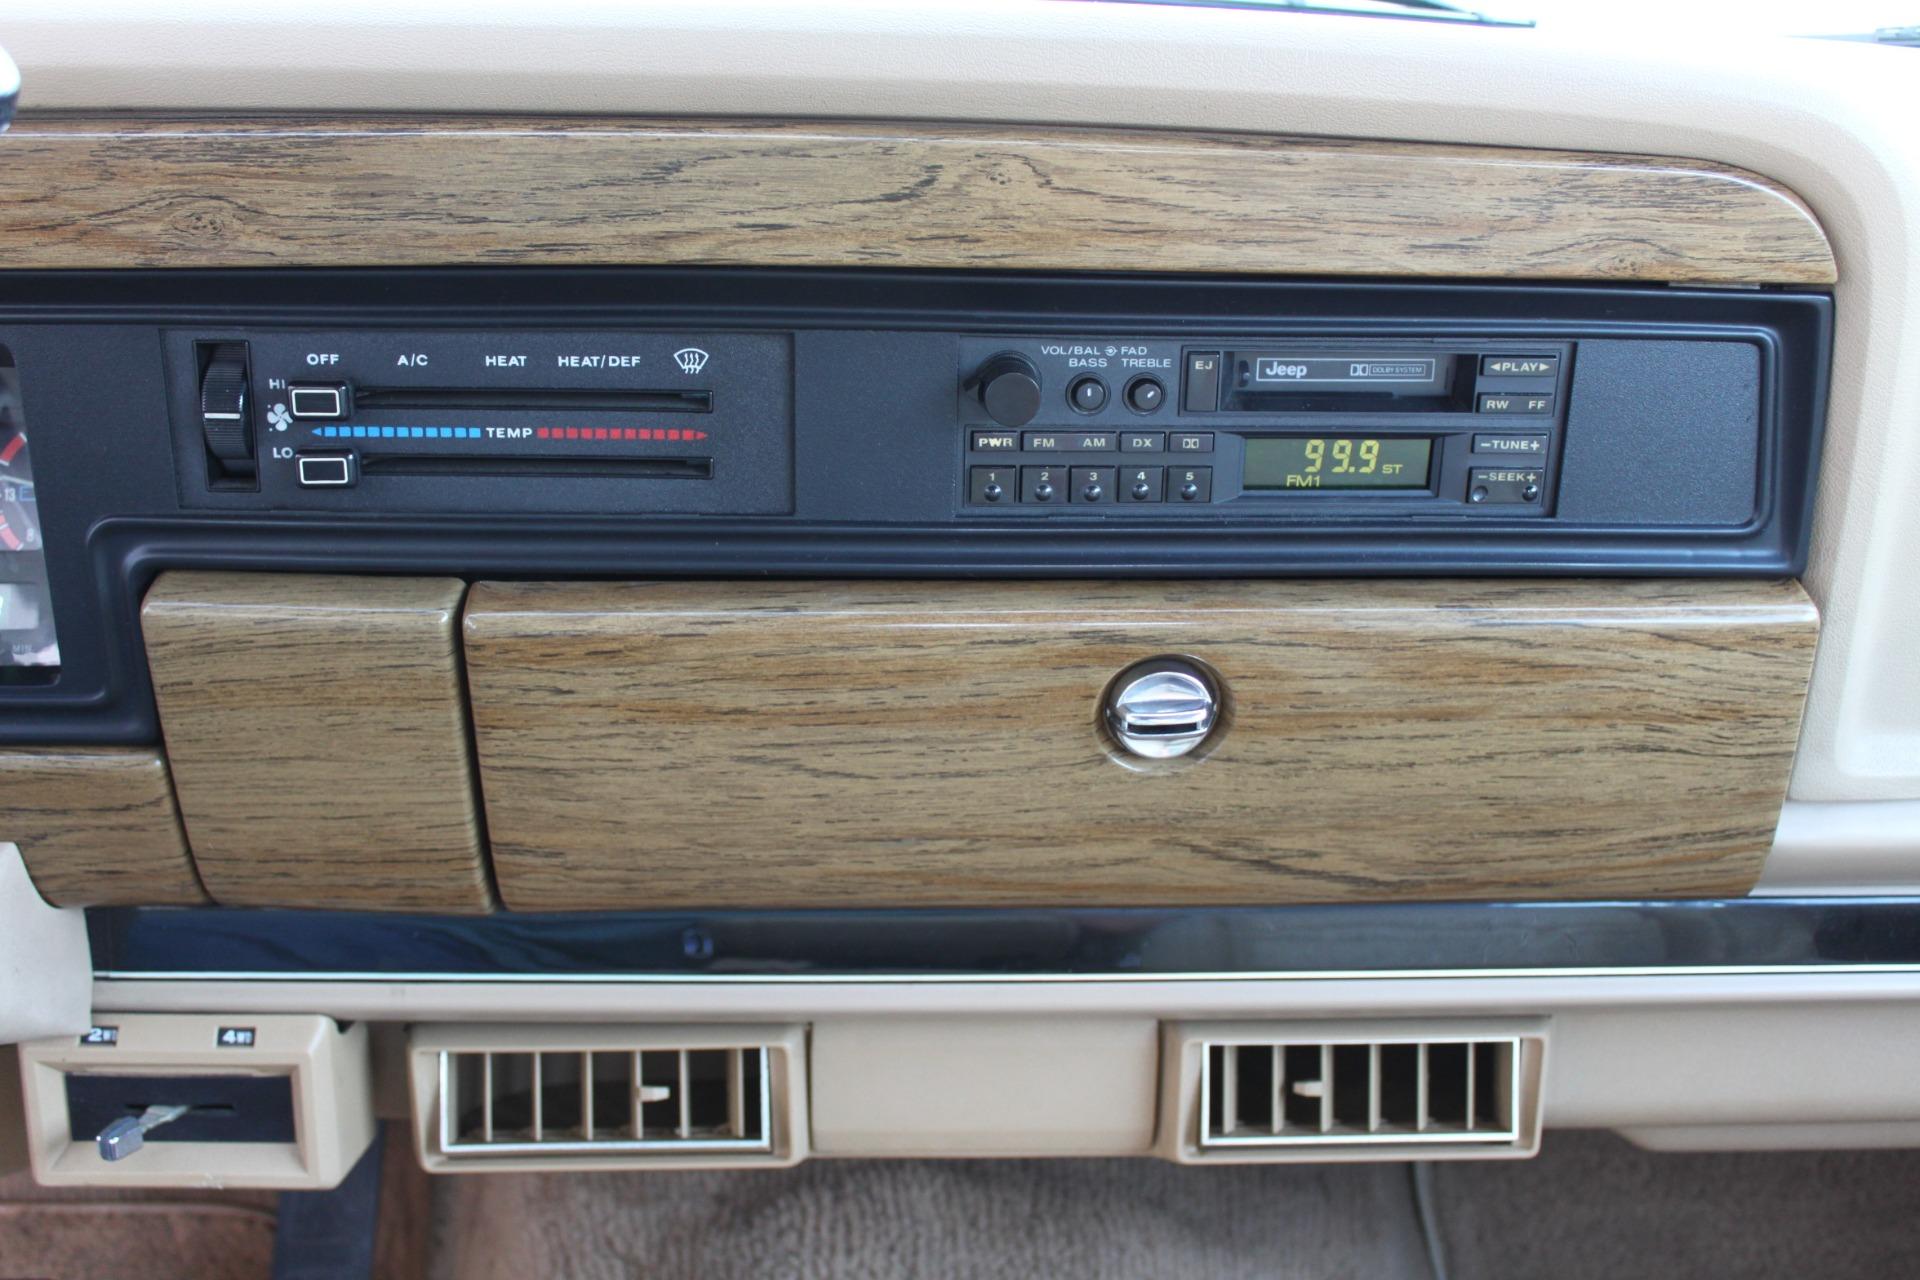 Used-1990-Jeep-Grand-Wagoneer-4X4-Lamborghini